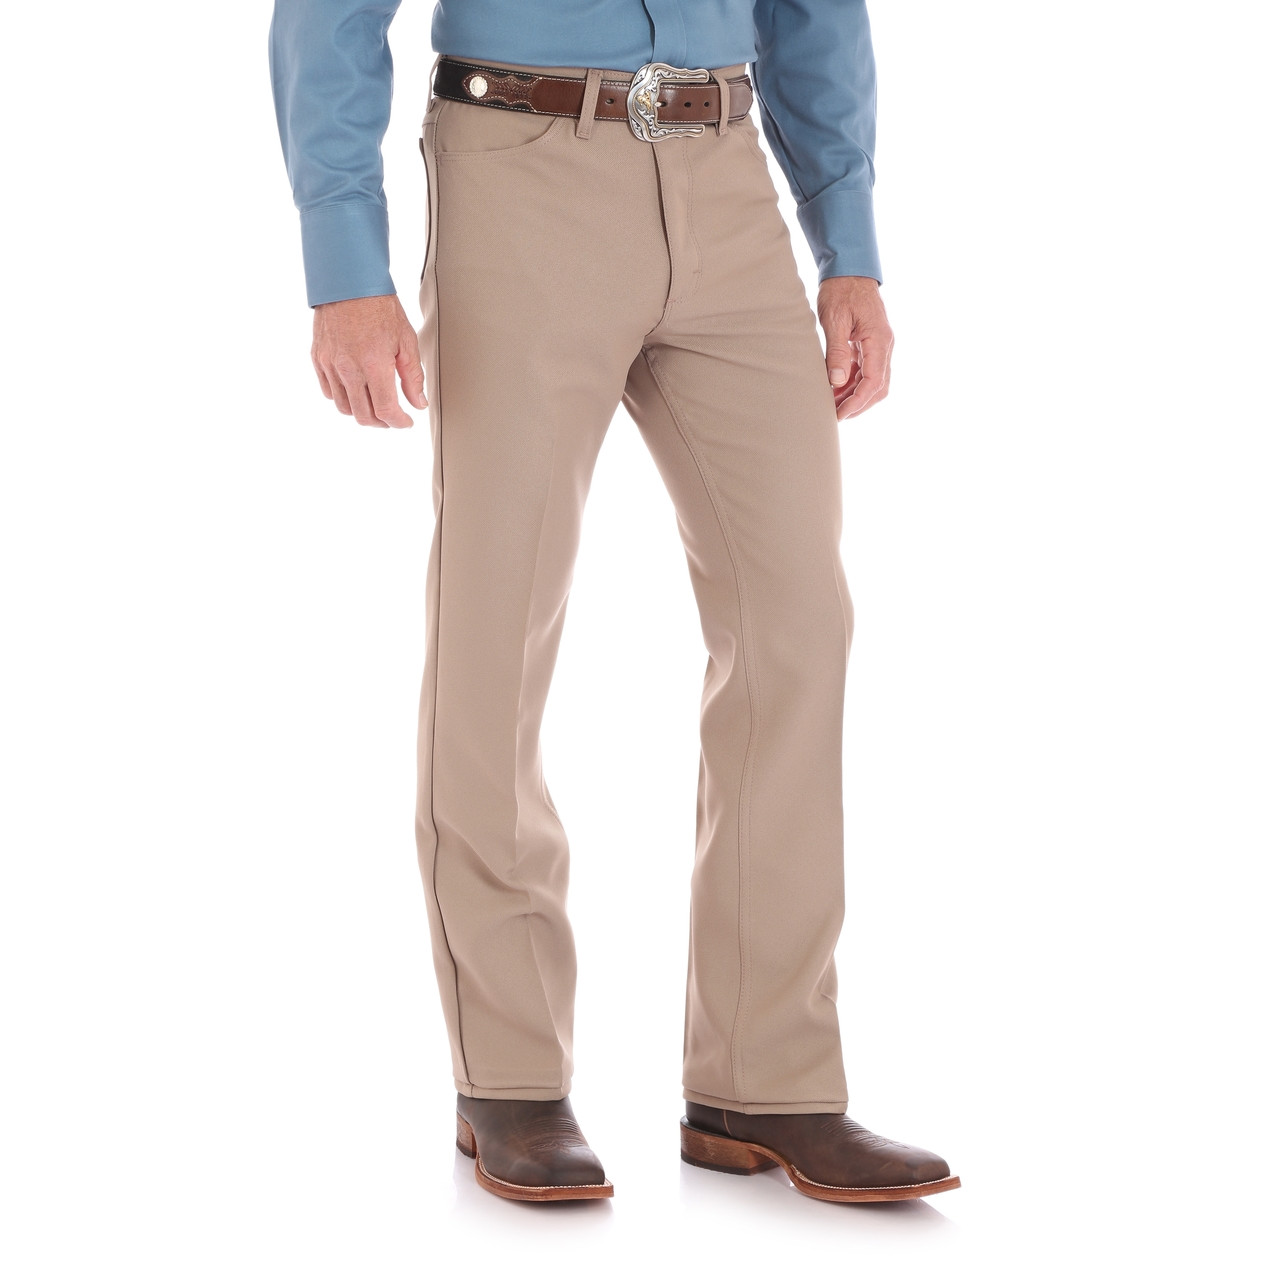 TAN Wrangler Wrancher Dress Jean